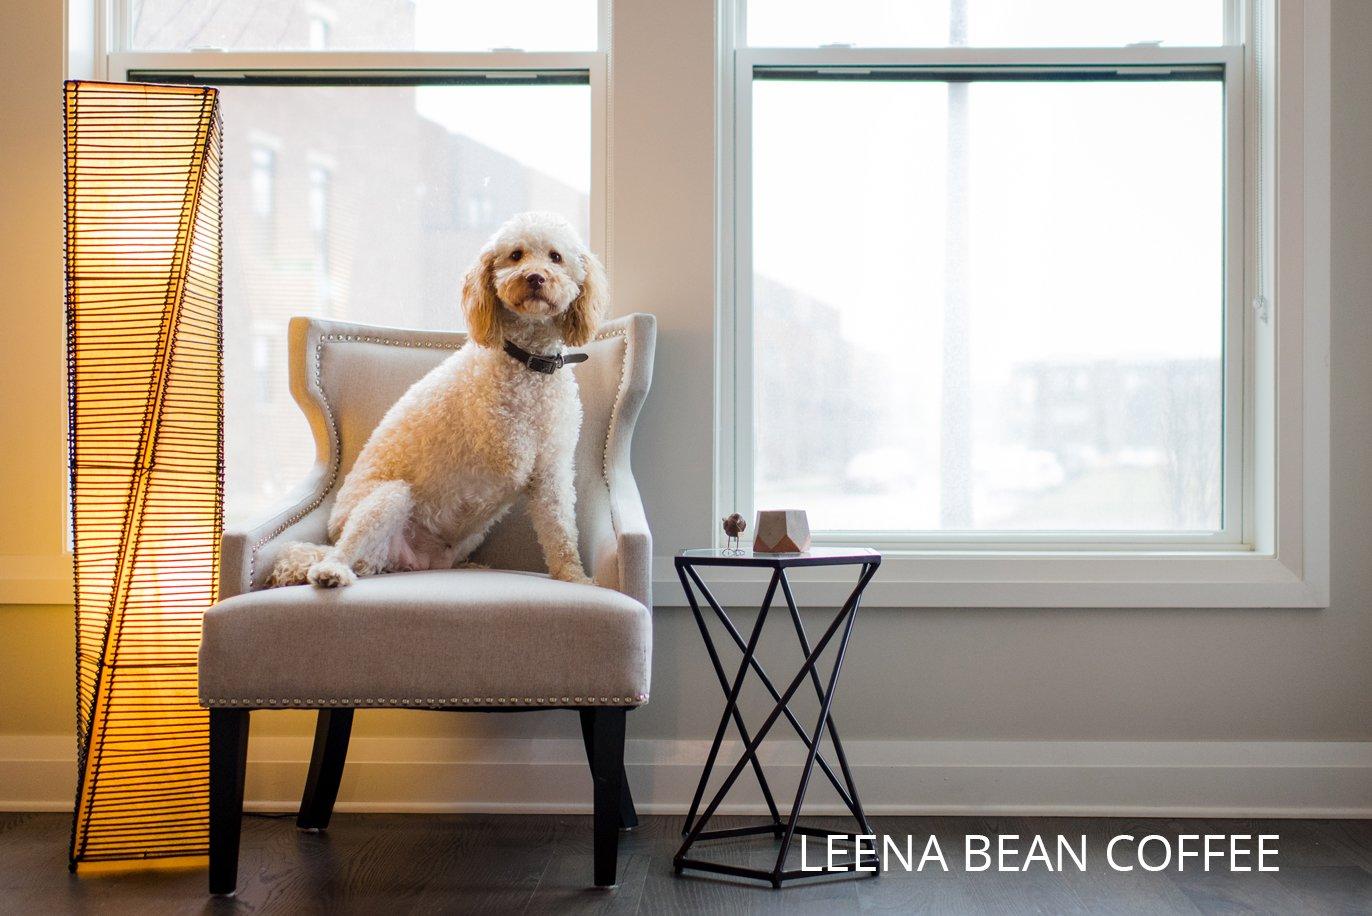 leena bean coffee